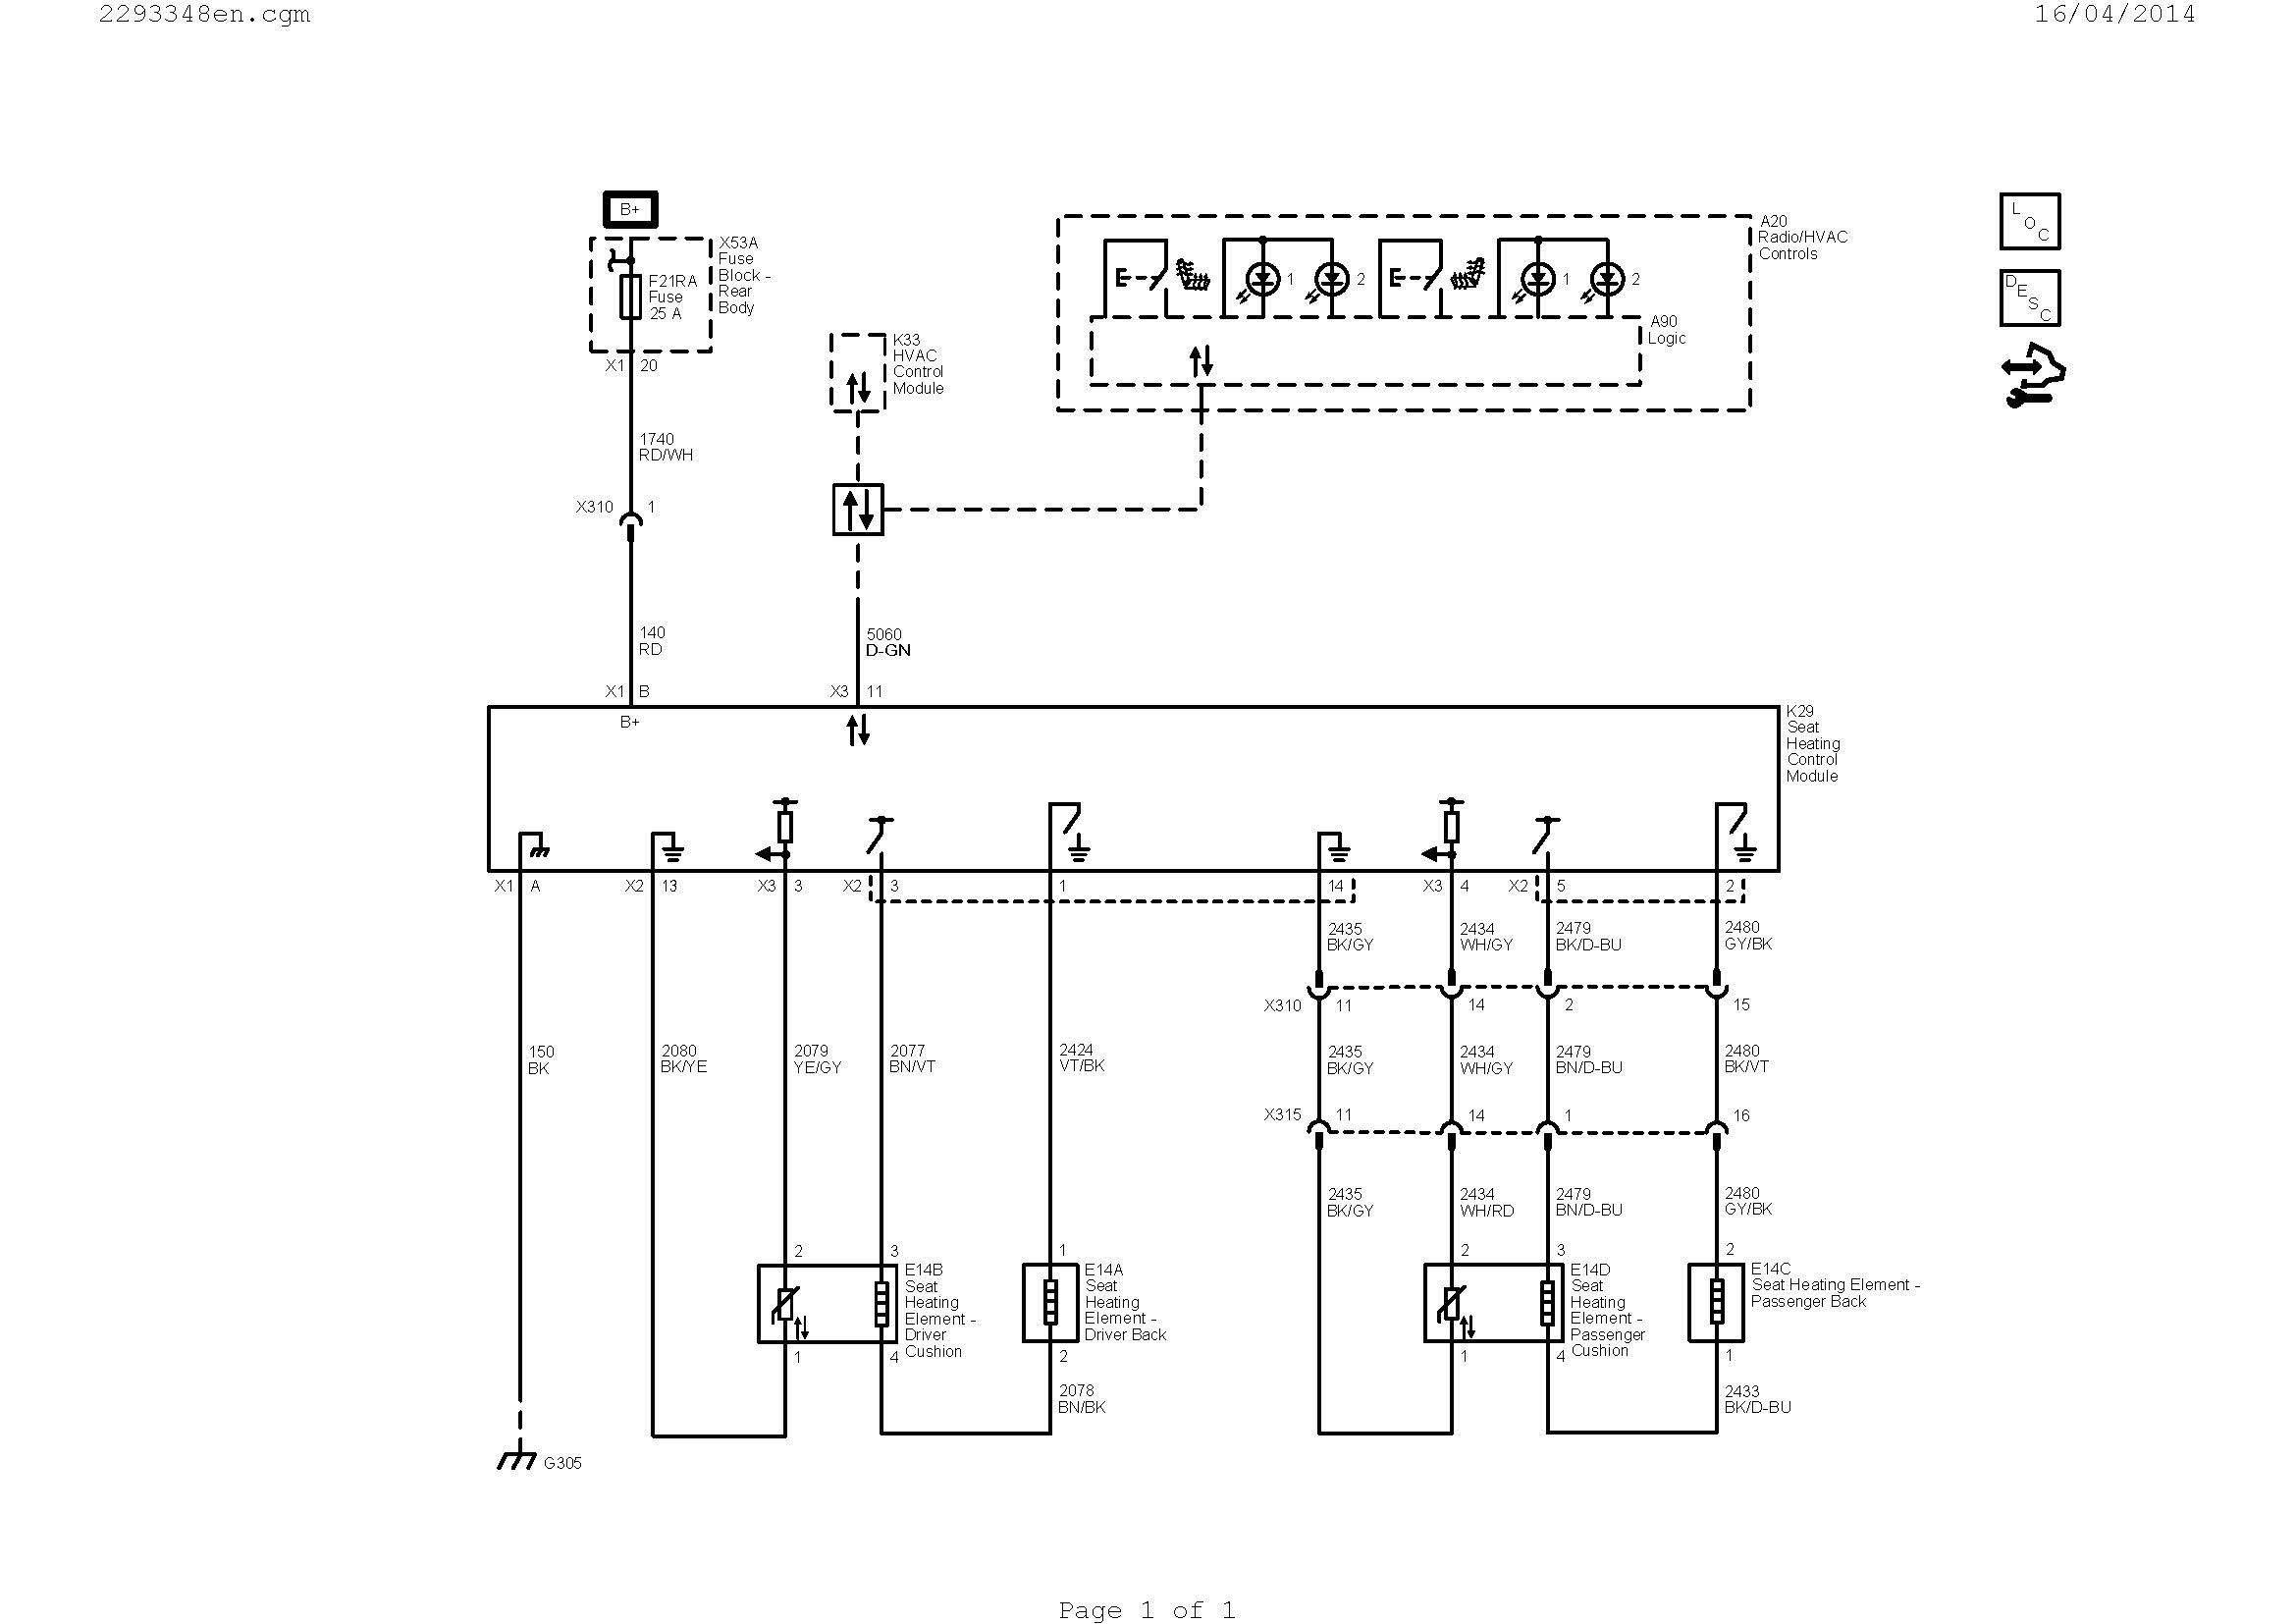 c70 wiring diagram wiring diagrams rh 42 crocodilecruisedarwin com volvo v70 wiring diagram 2004 volvo v70 wiring diagram 1998 [ 2339 x 1654 Pixel ]